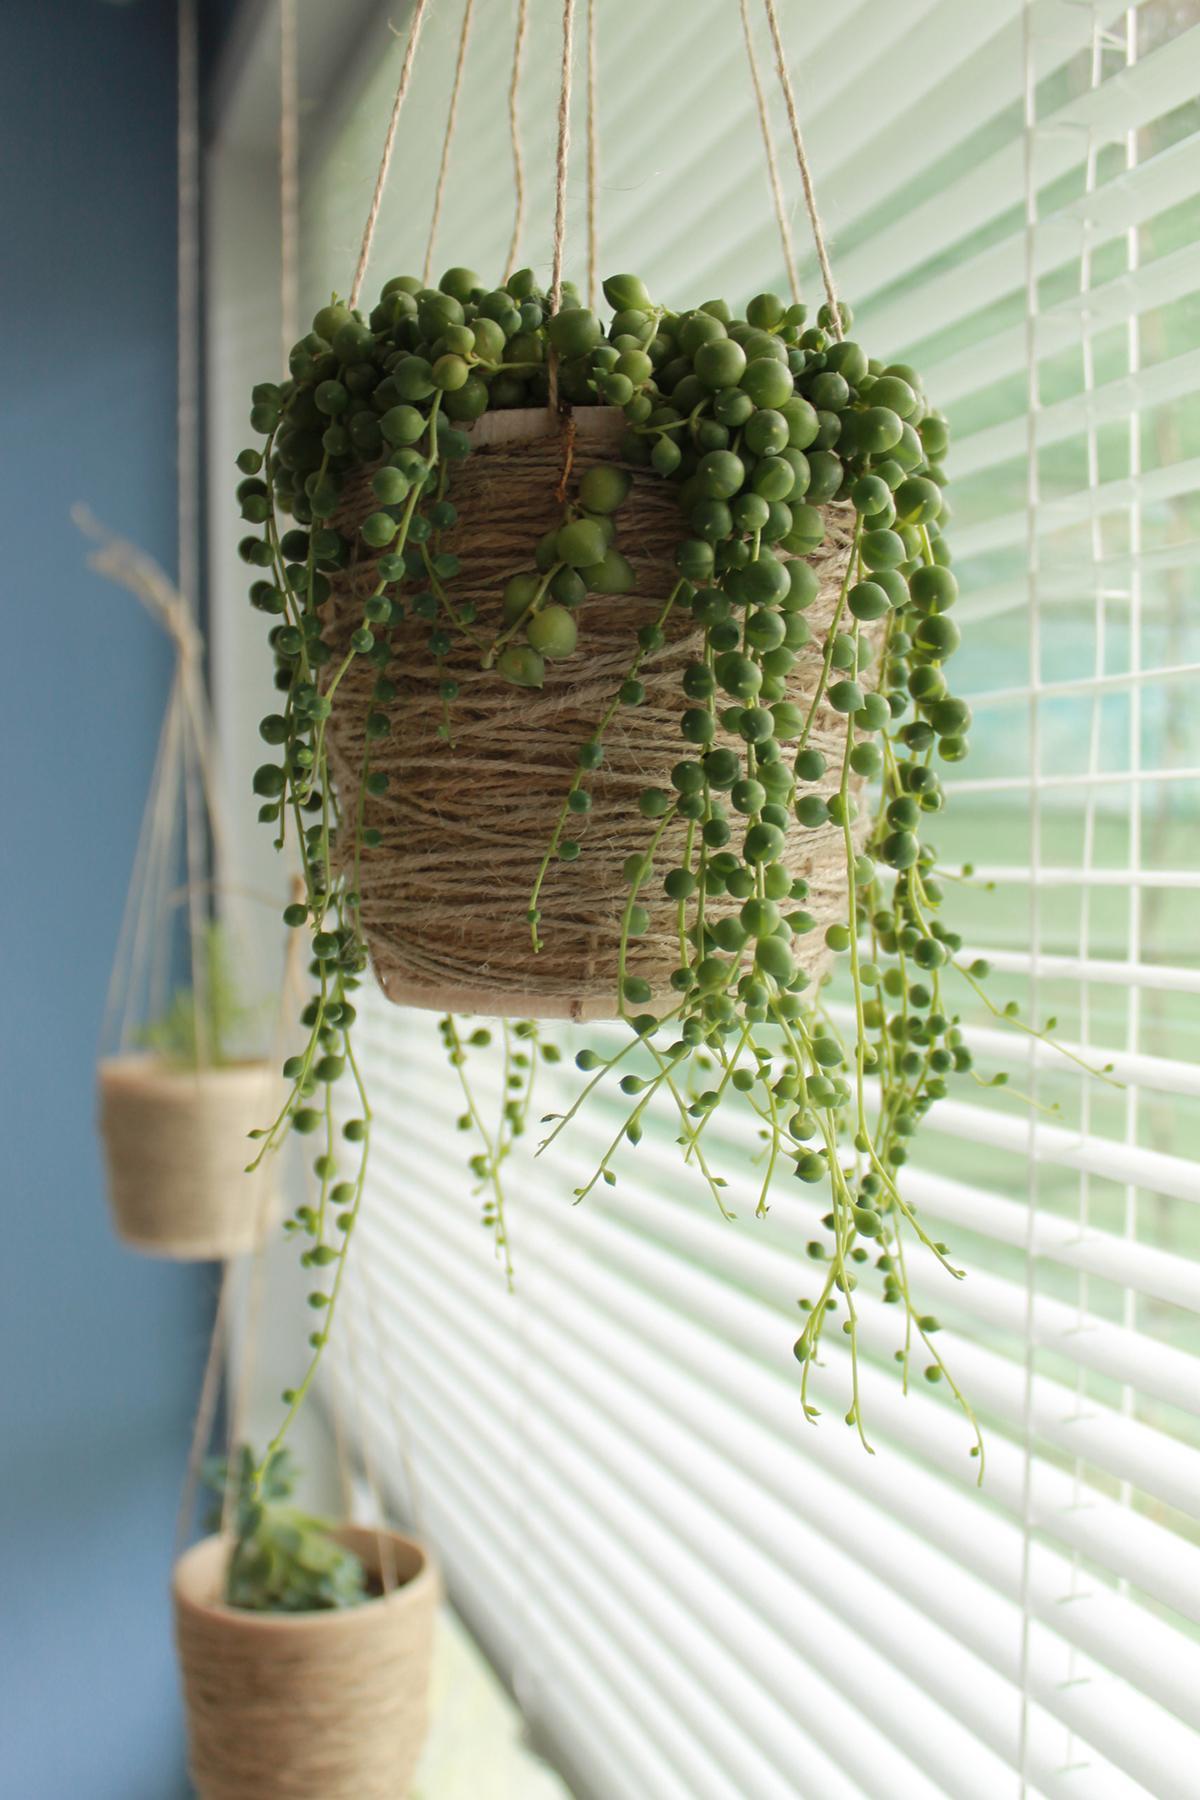 string-of-pears-hanging-indoor-plant-1580934856598.jpg